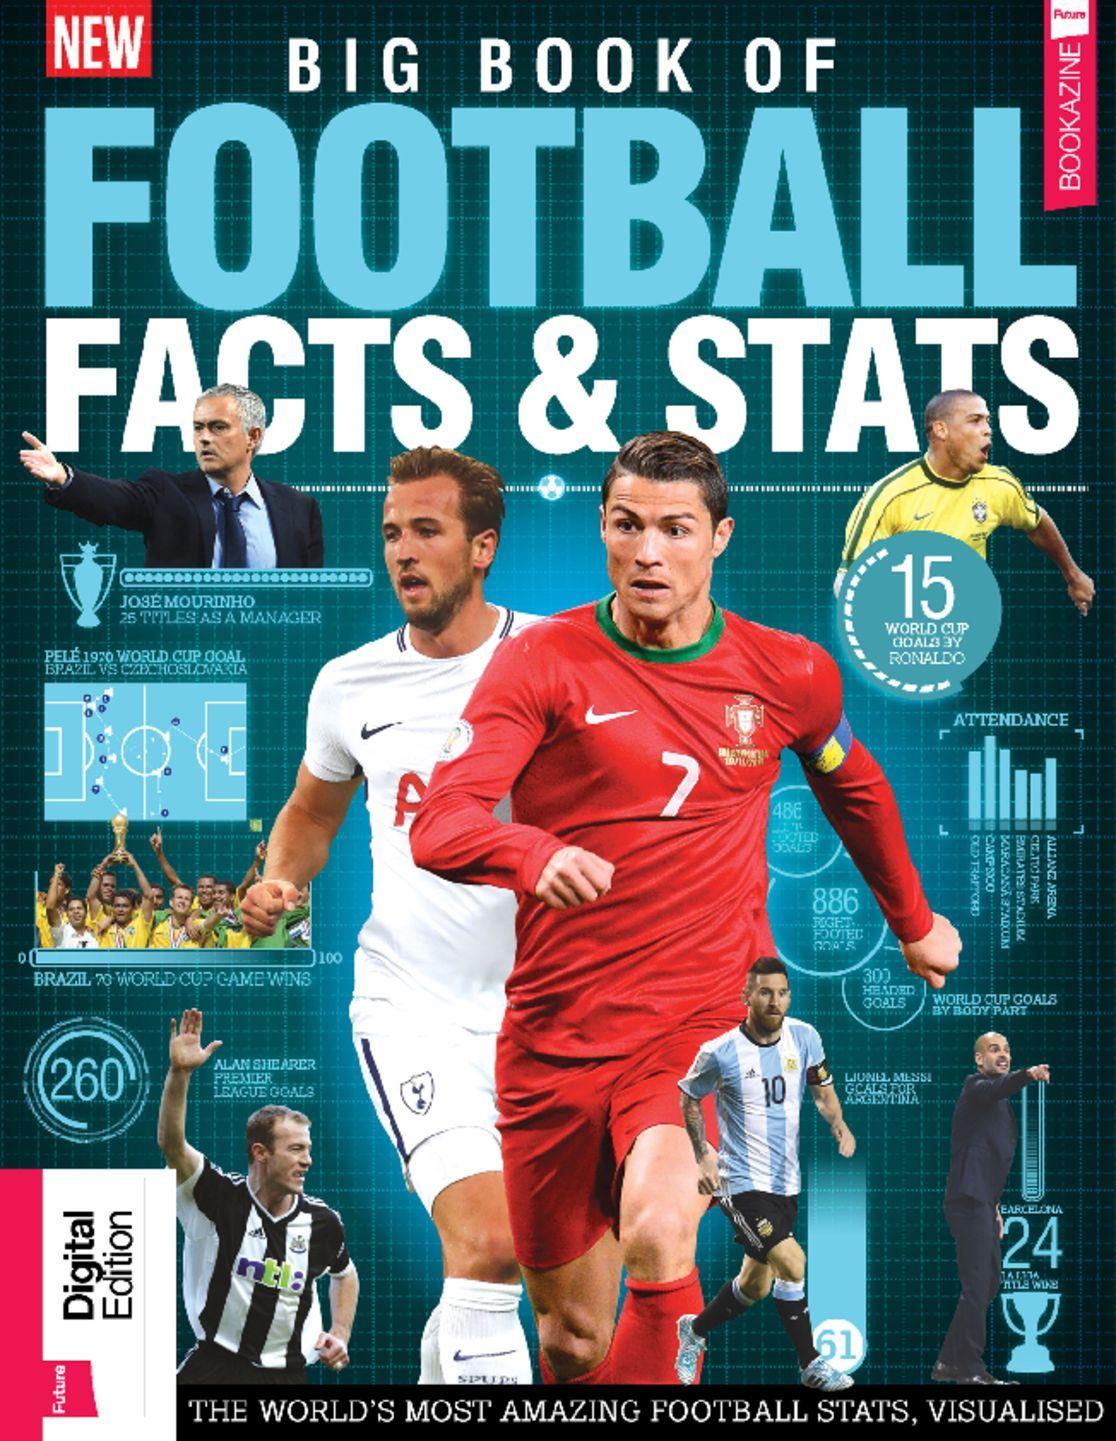 Big Book of Football Facts Stats Digital